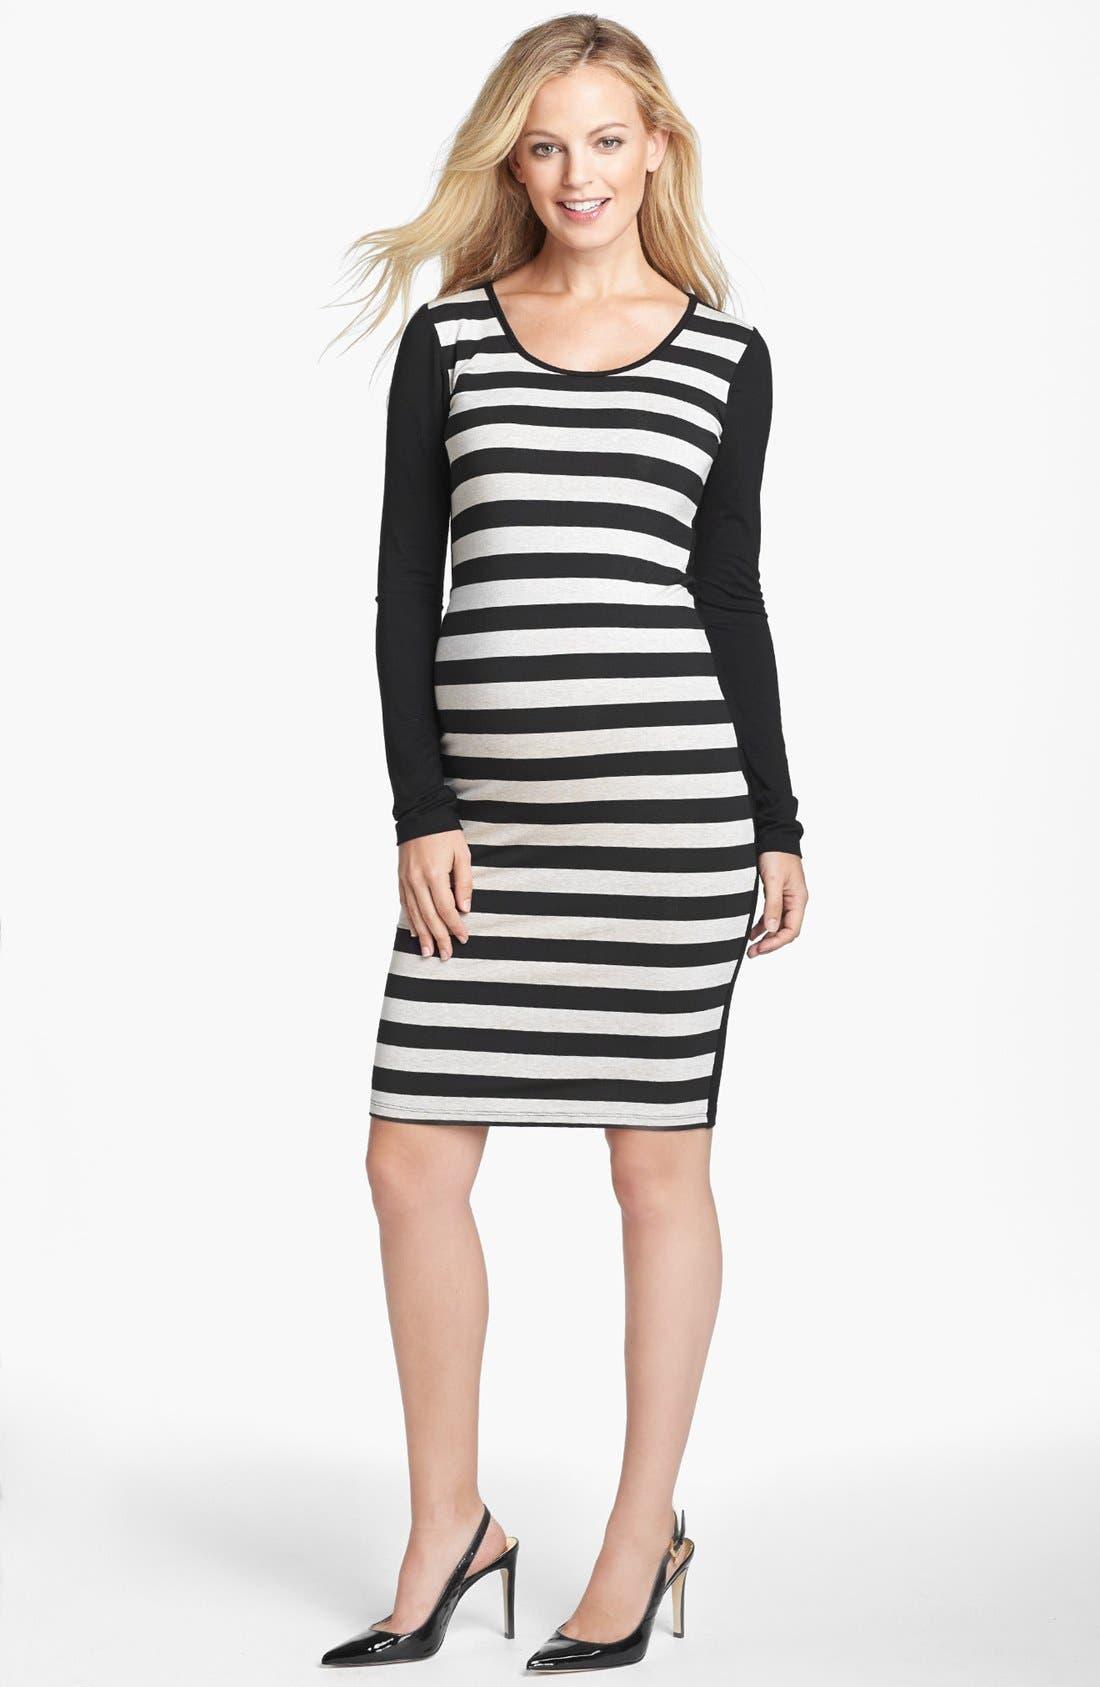 Alternate Image 1 Selected - Nom Maternity 'Krystal' Stripe Maternity Dress